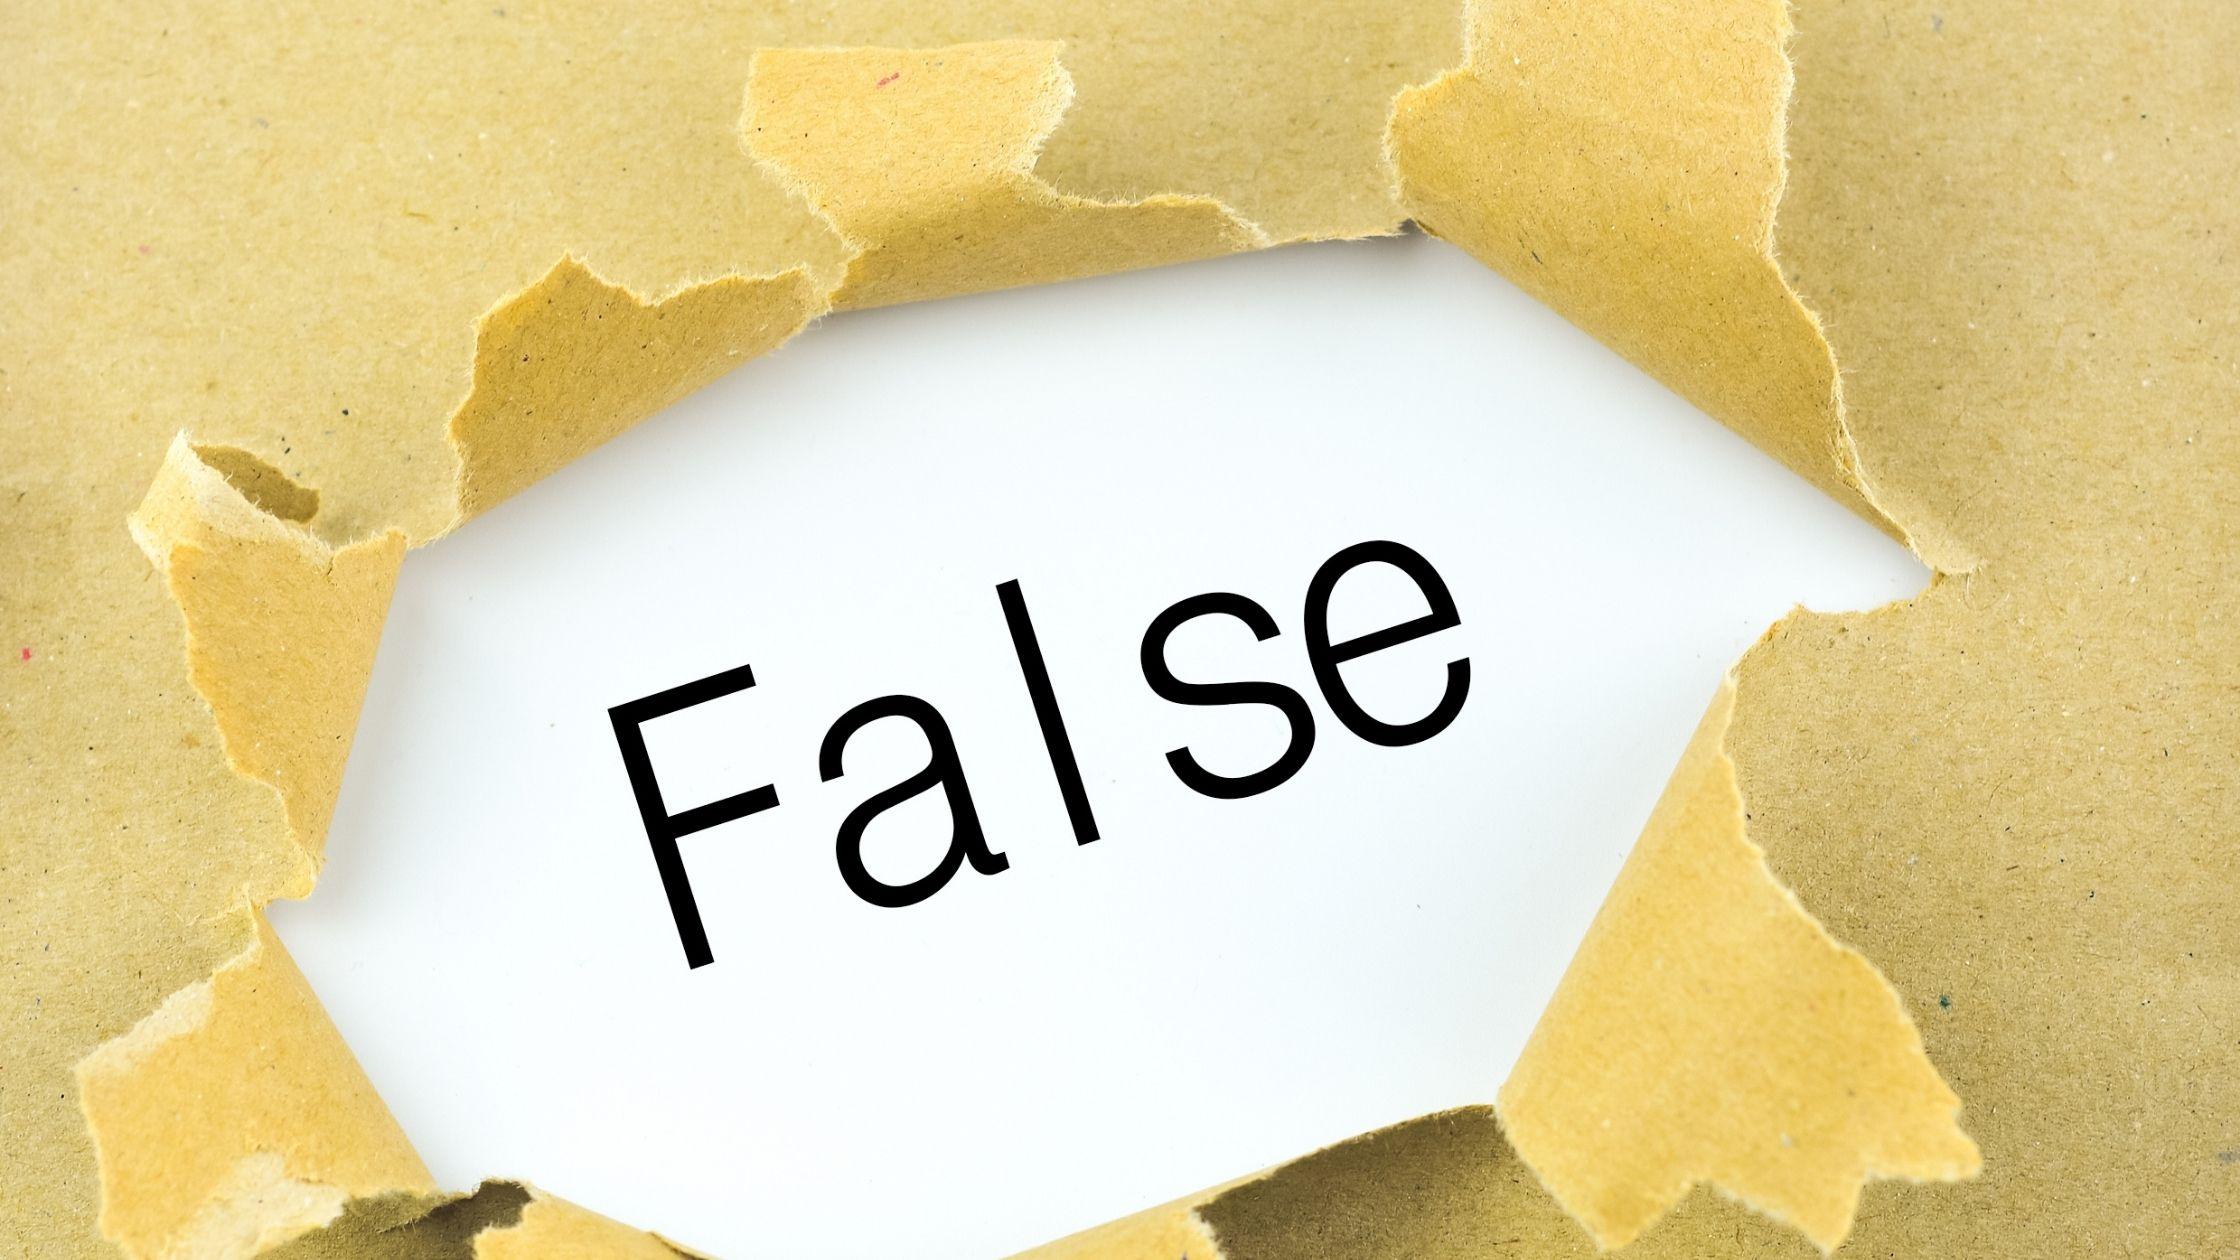 remove false information